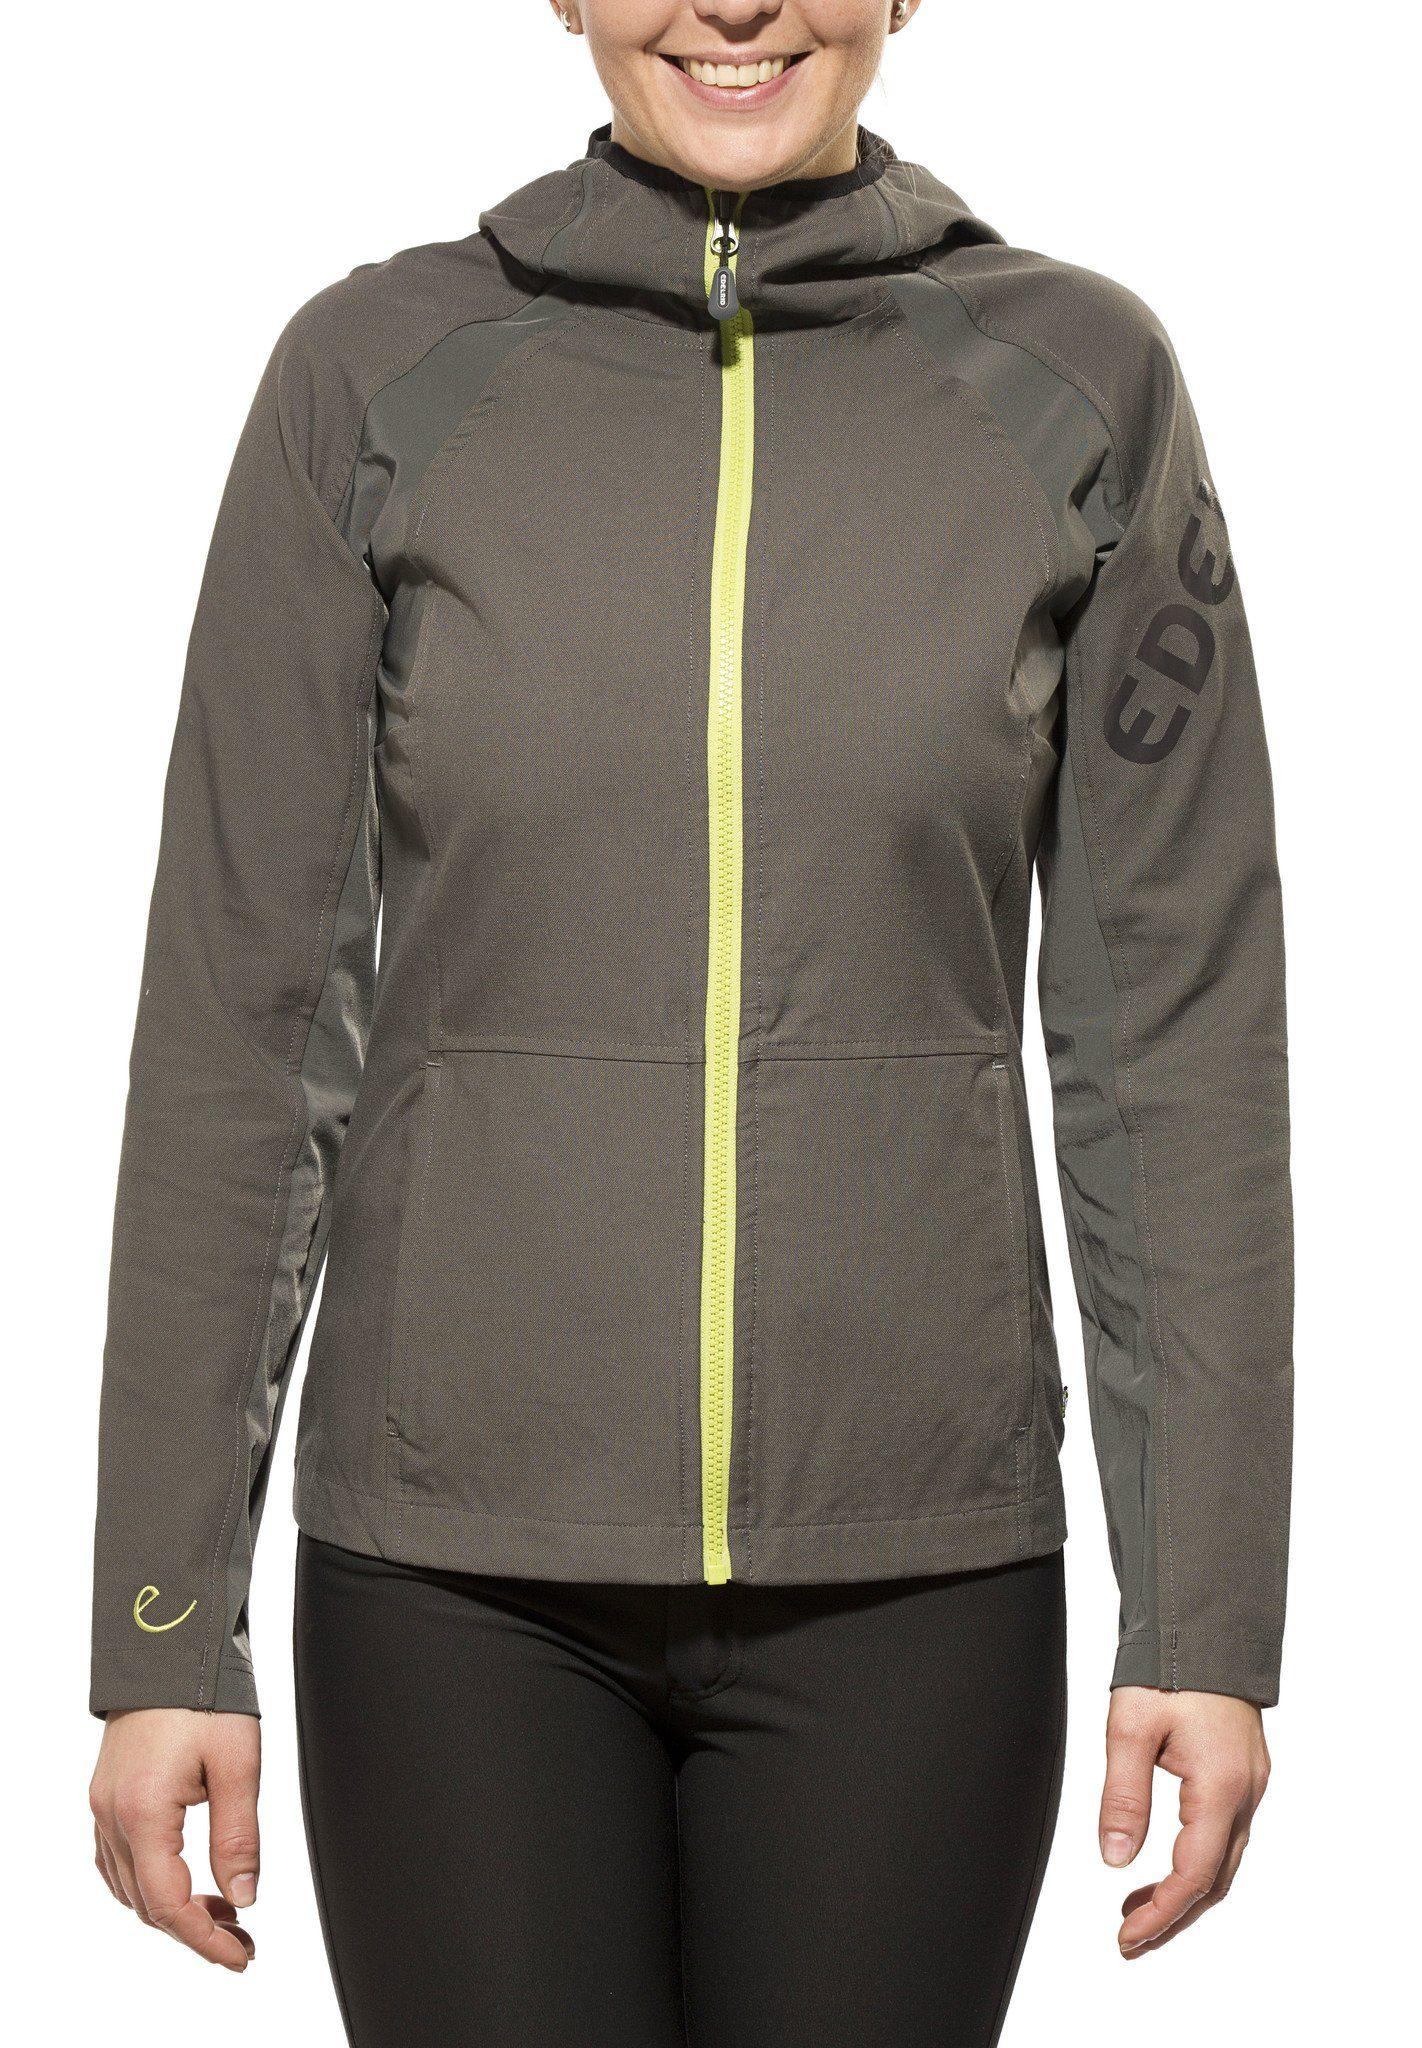 Edelrid Outdoorjacke »Marwin Jacket«